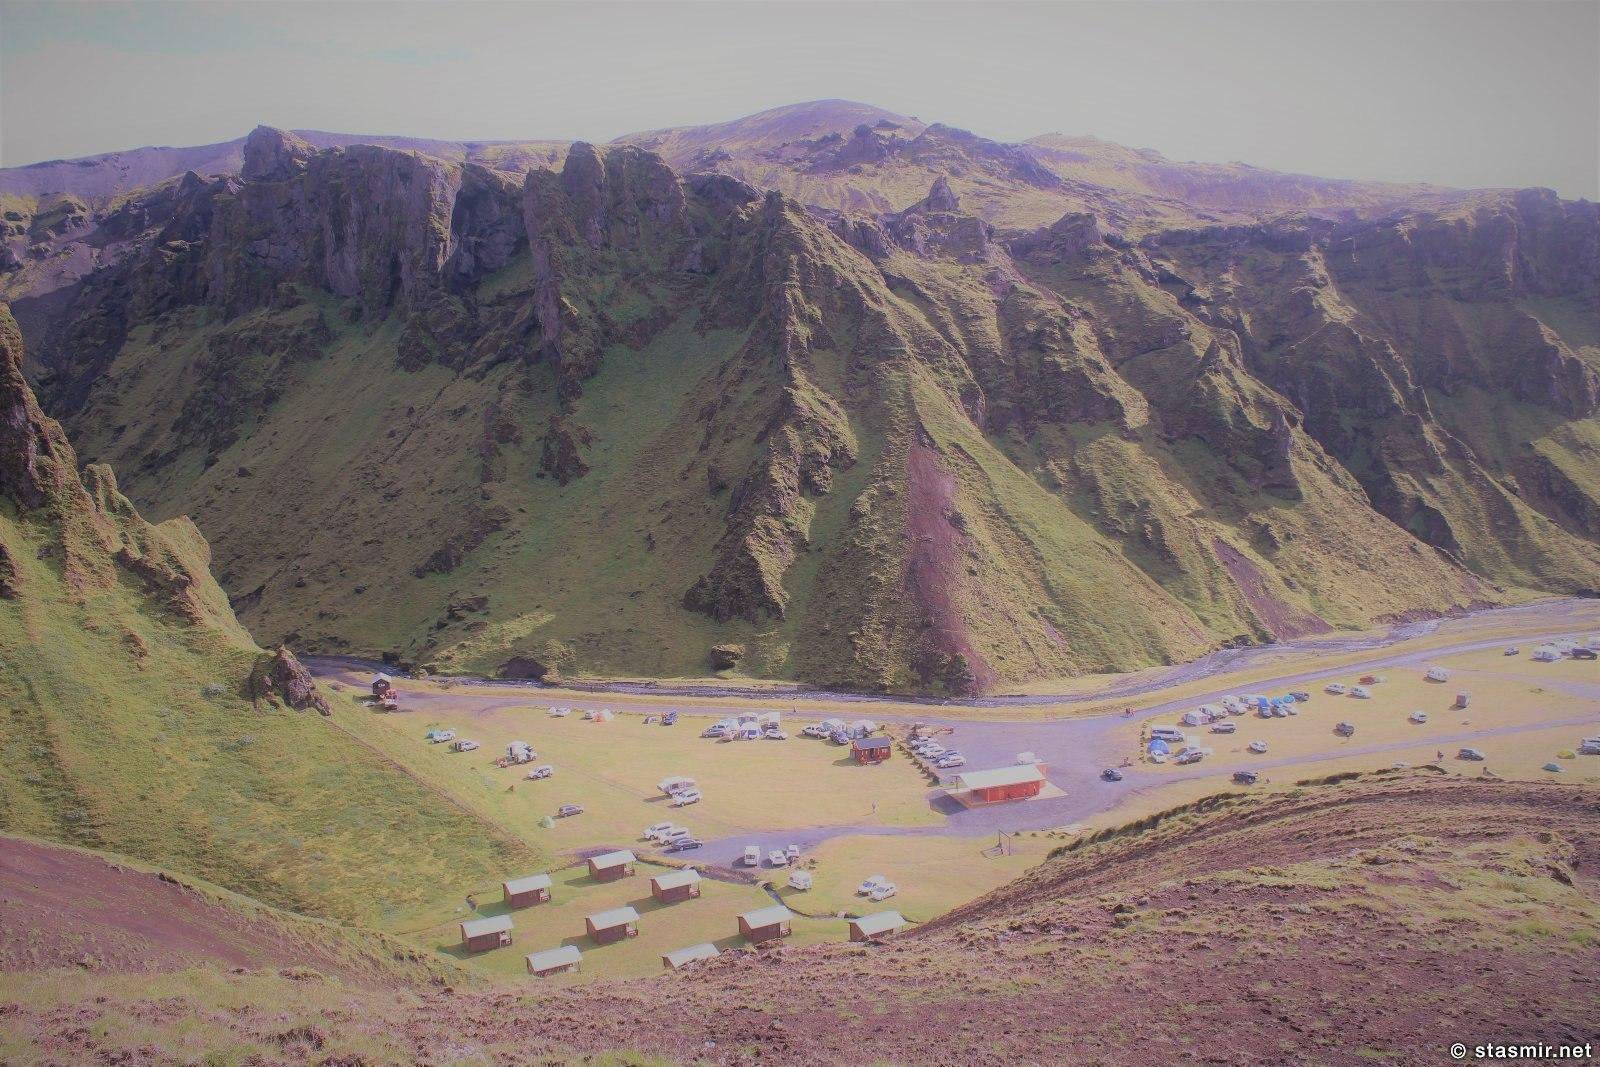 кемпинг, вид от начала пути, Такгиль, Þakgíl, Тагил, фото Стасмир, photo Stasmir